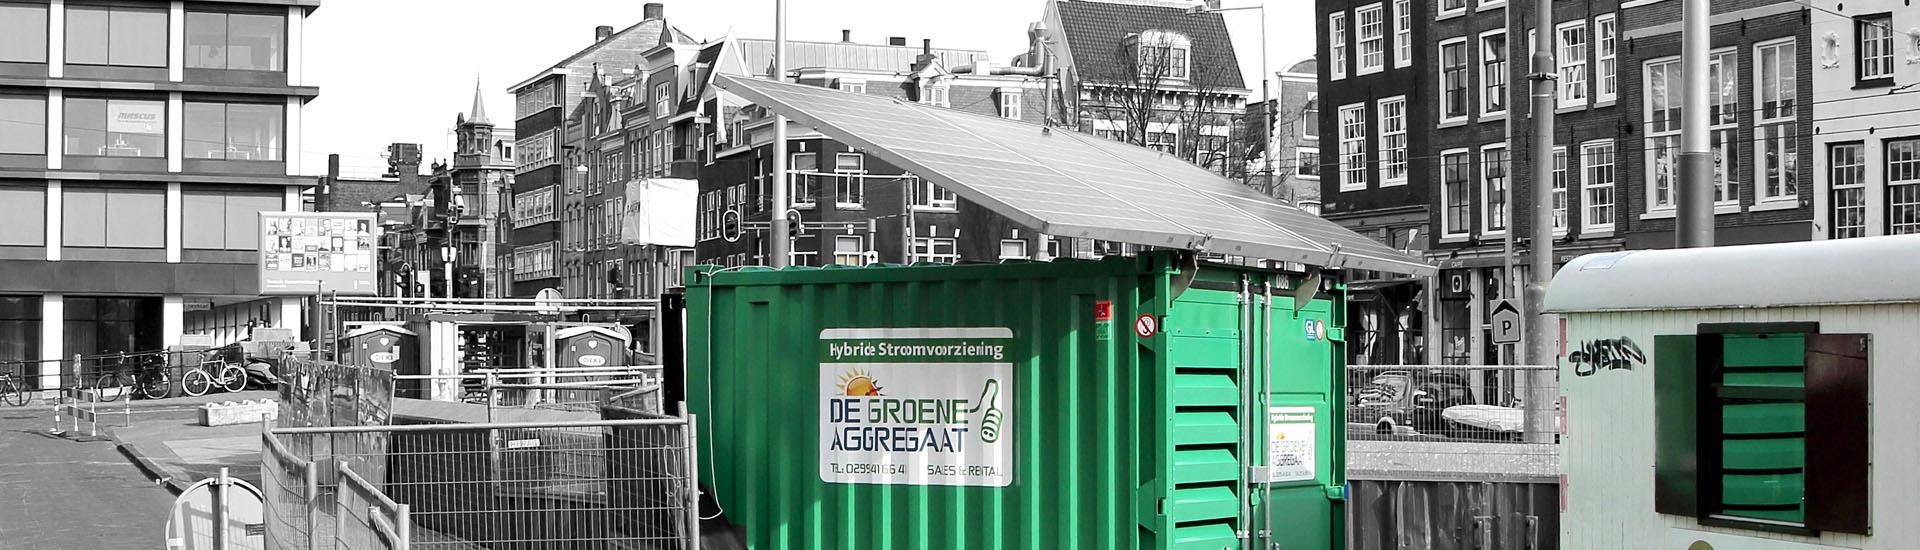 the-green-solar-power-generator